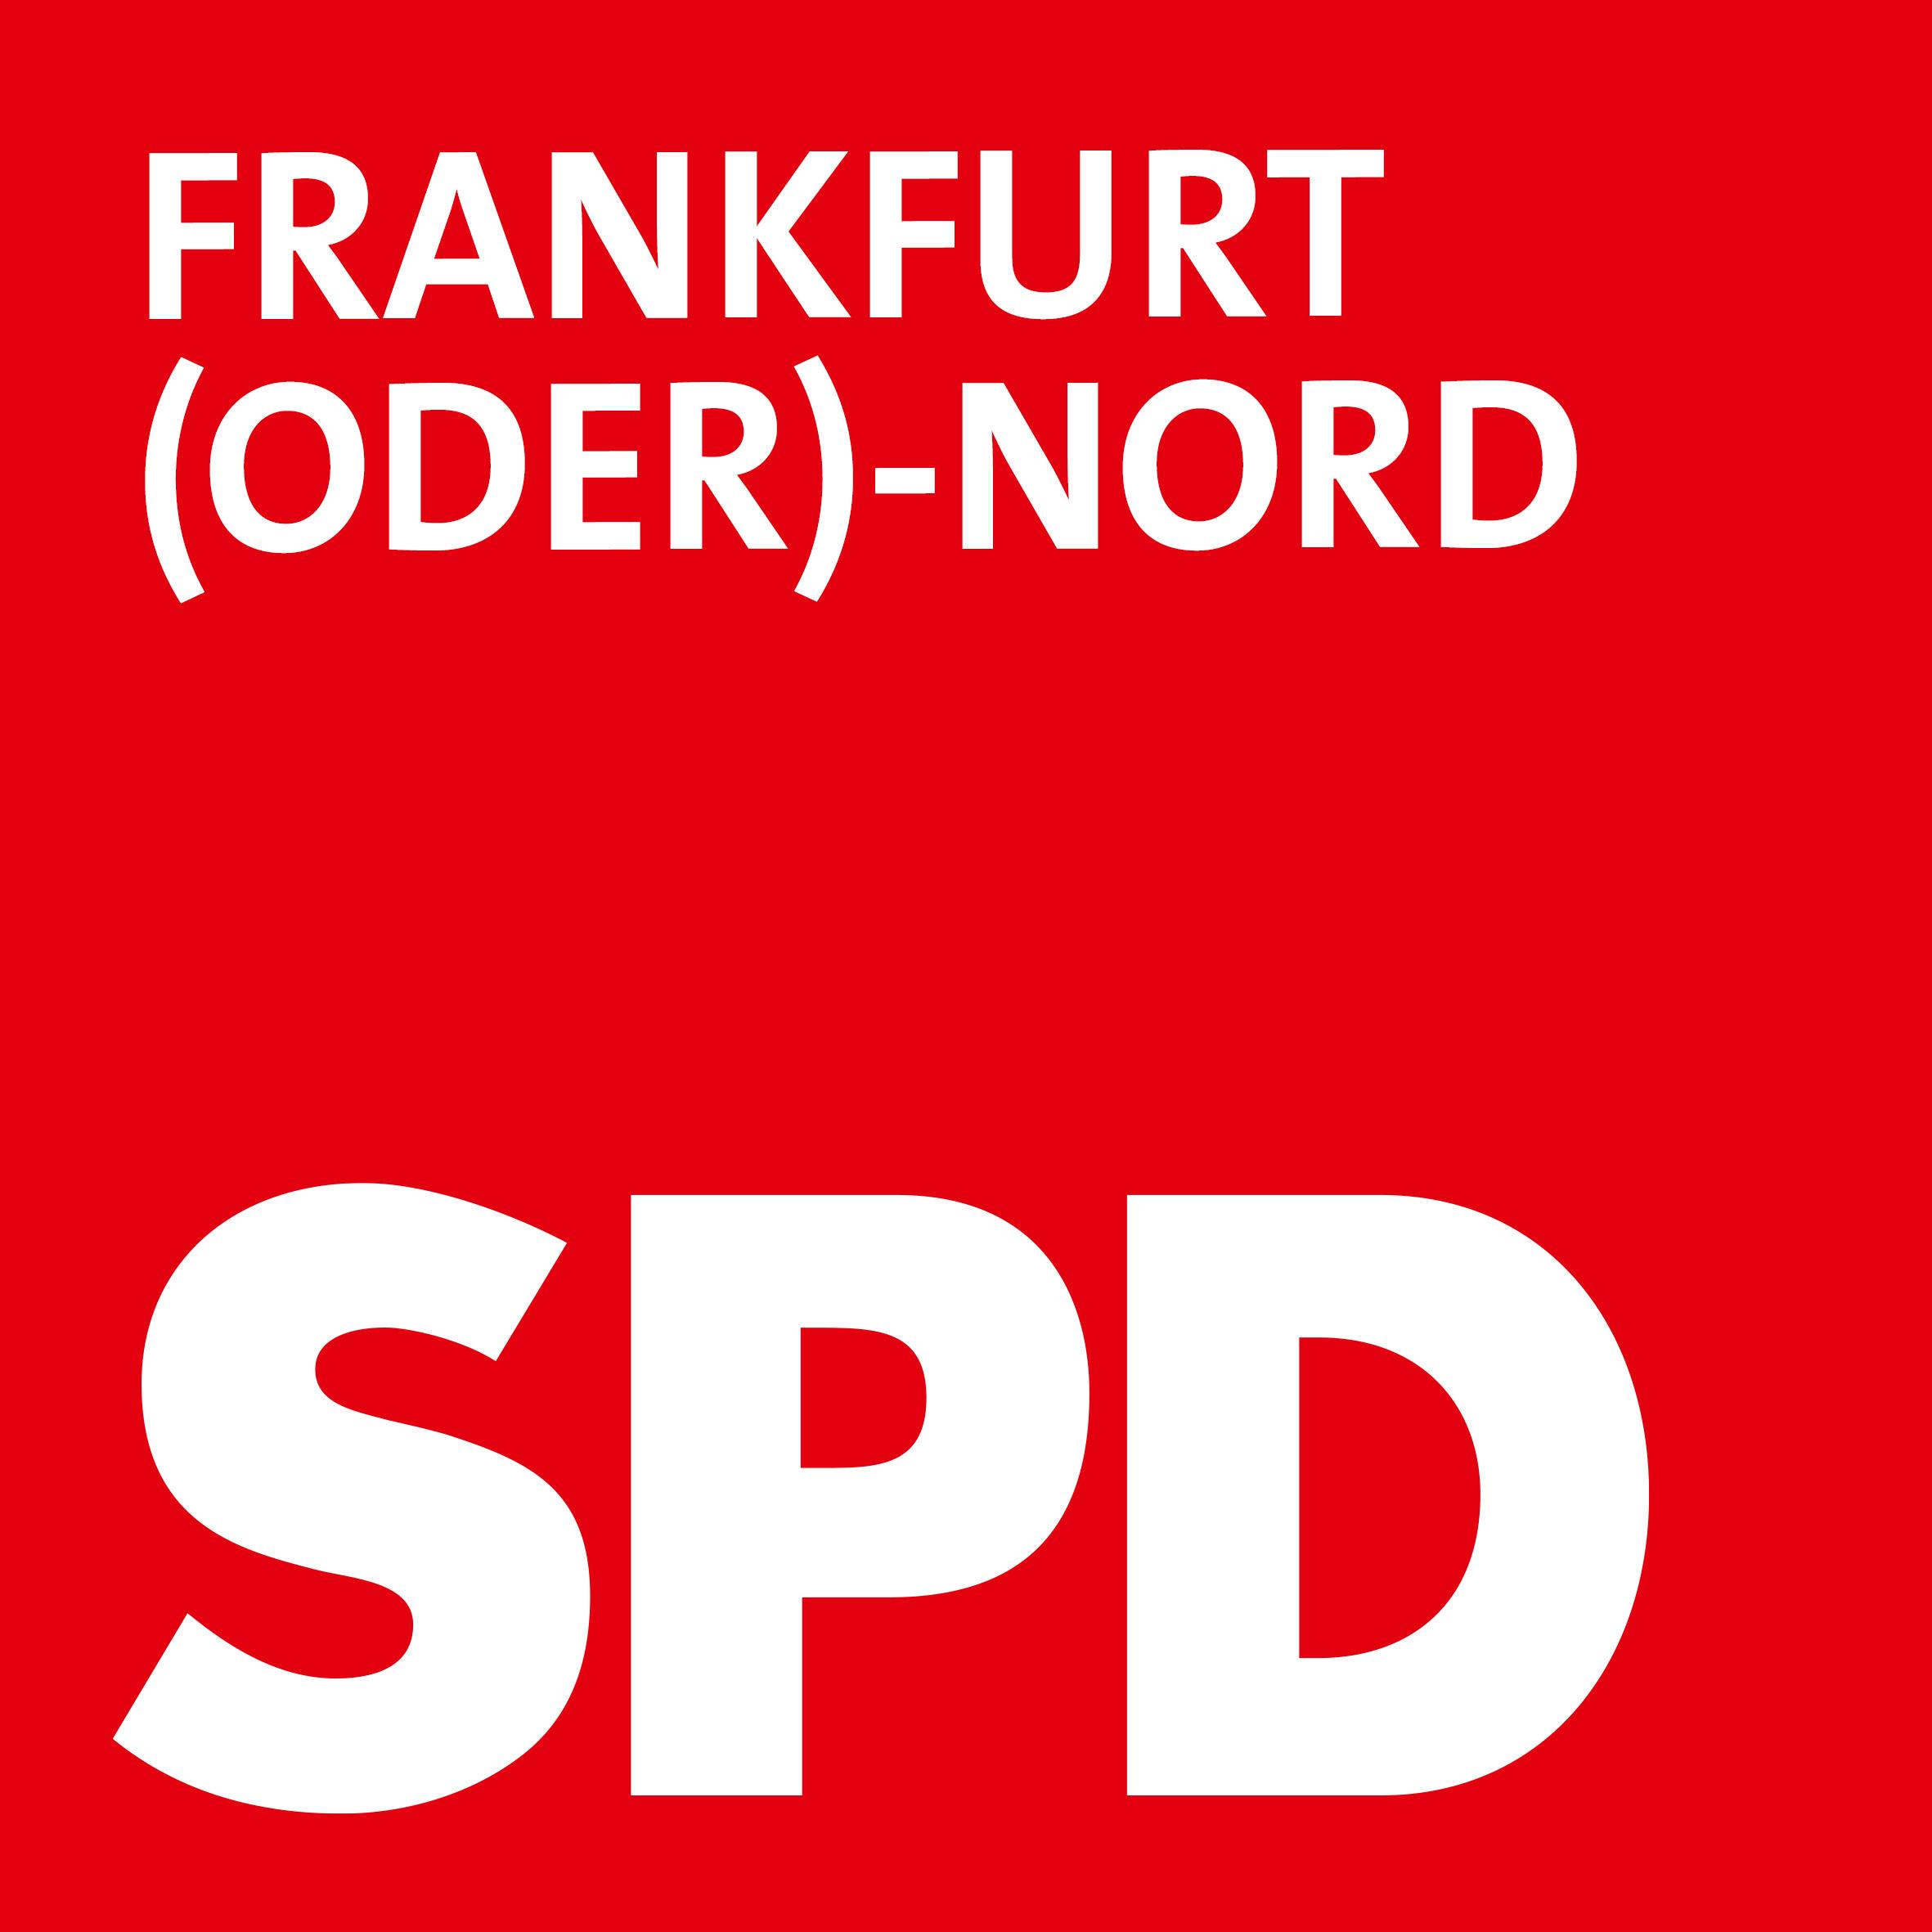 SPD Frankfurt (Oder)-Nord